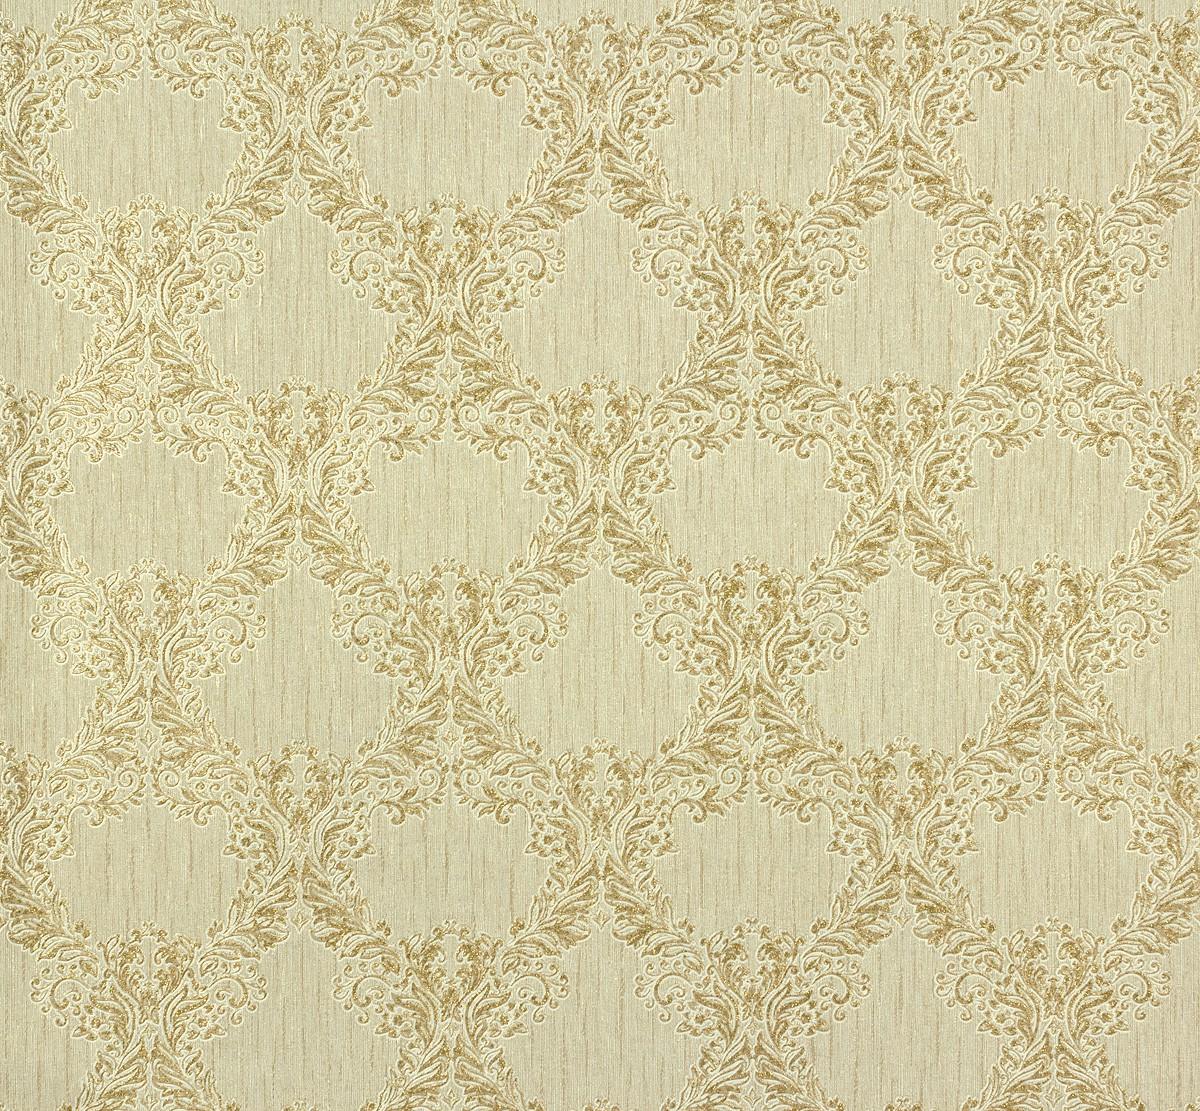 vliestapete barock creme gold 02355 40 0235540 tapete p s como 3 19 1qm ebay. Black Bedroom Furniture Sets. Home Design Ideas